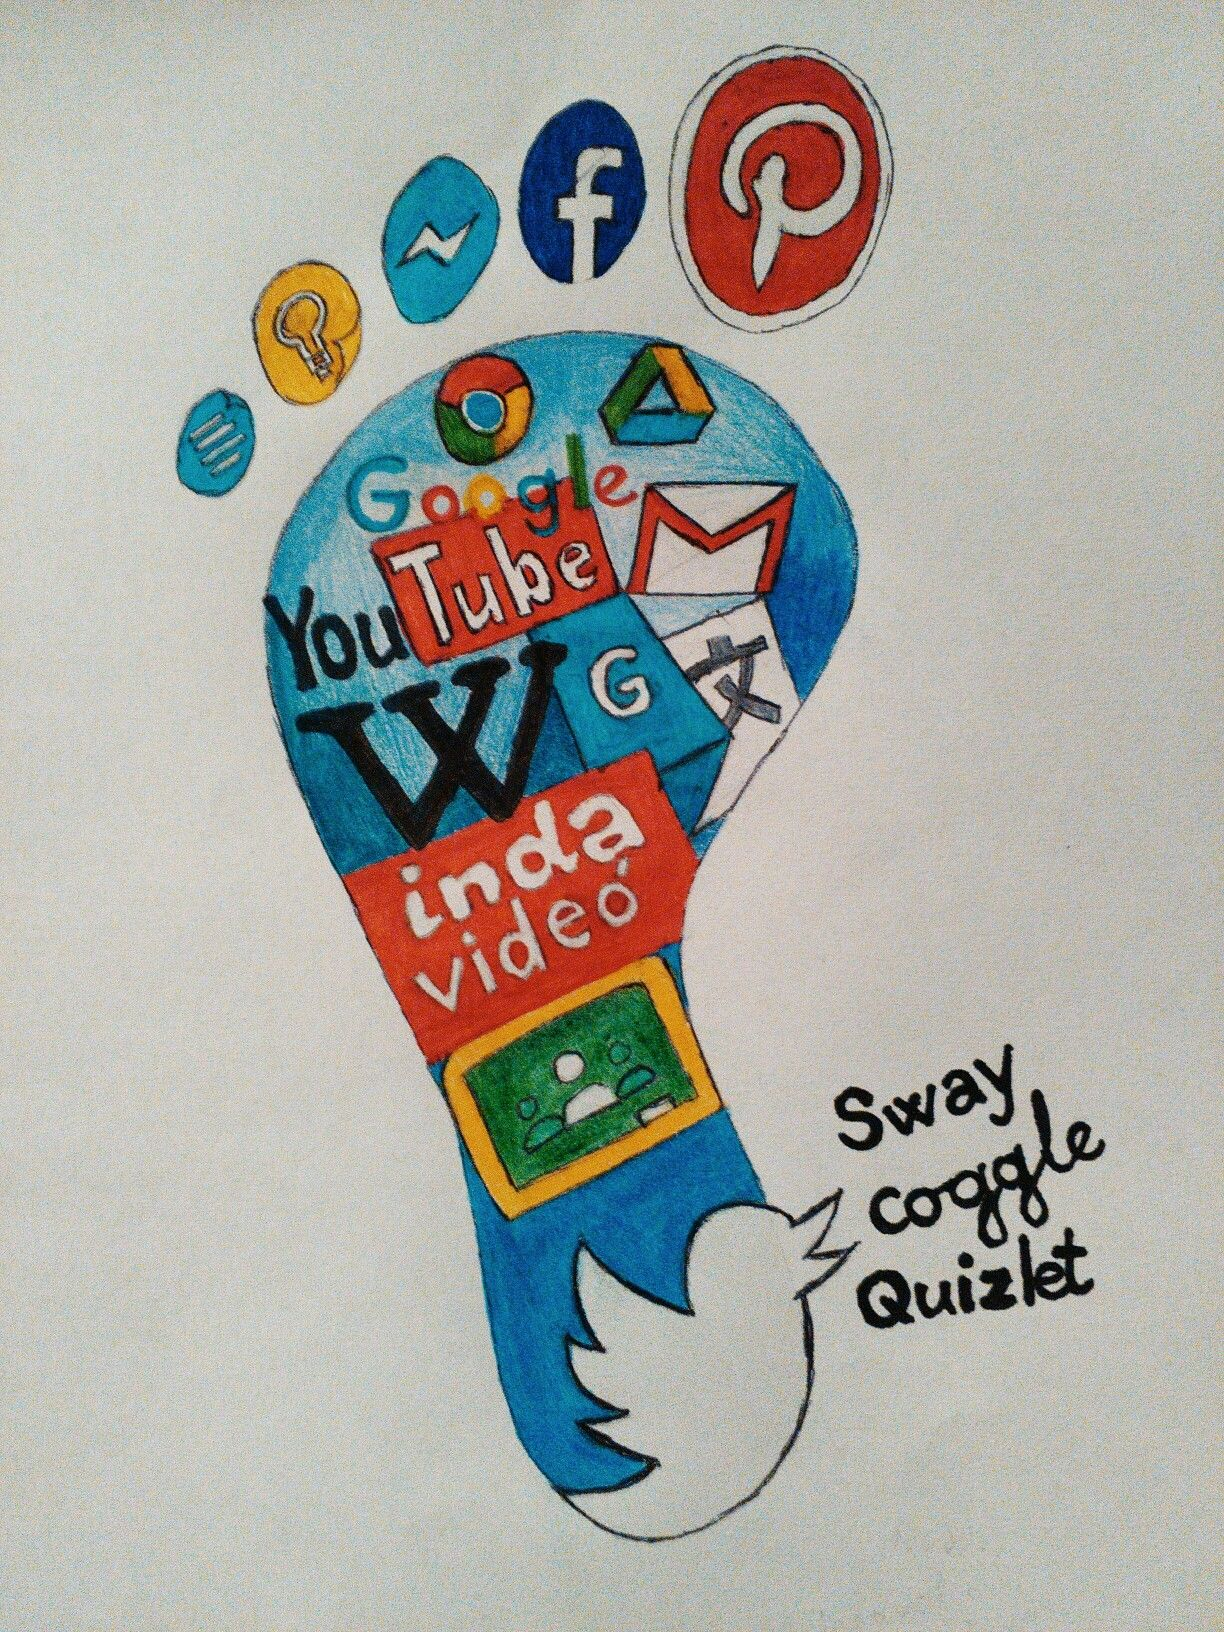 My digital footprint drawing. Trace NumériqueMes Dessins